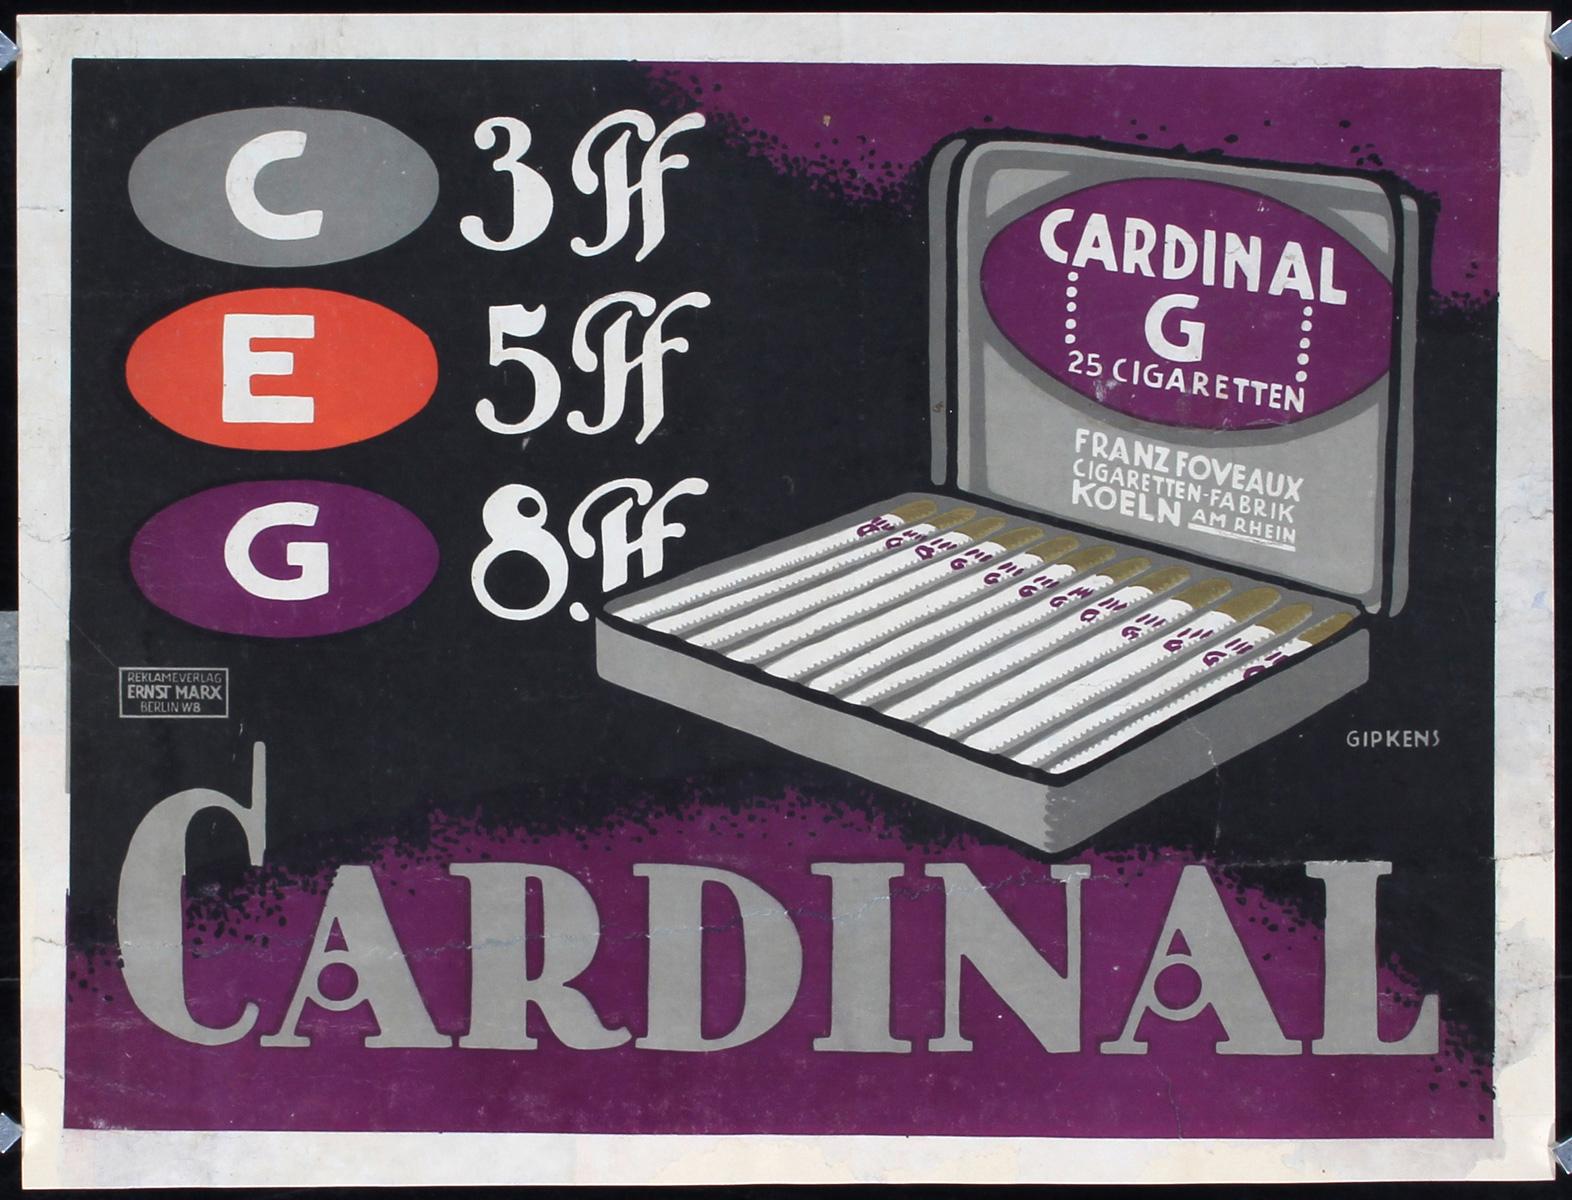 Cardinal By Gipkens